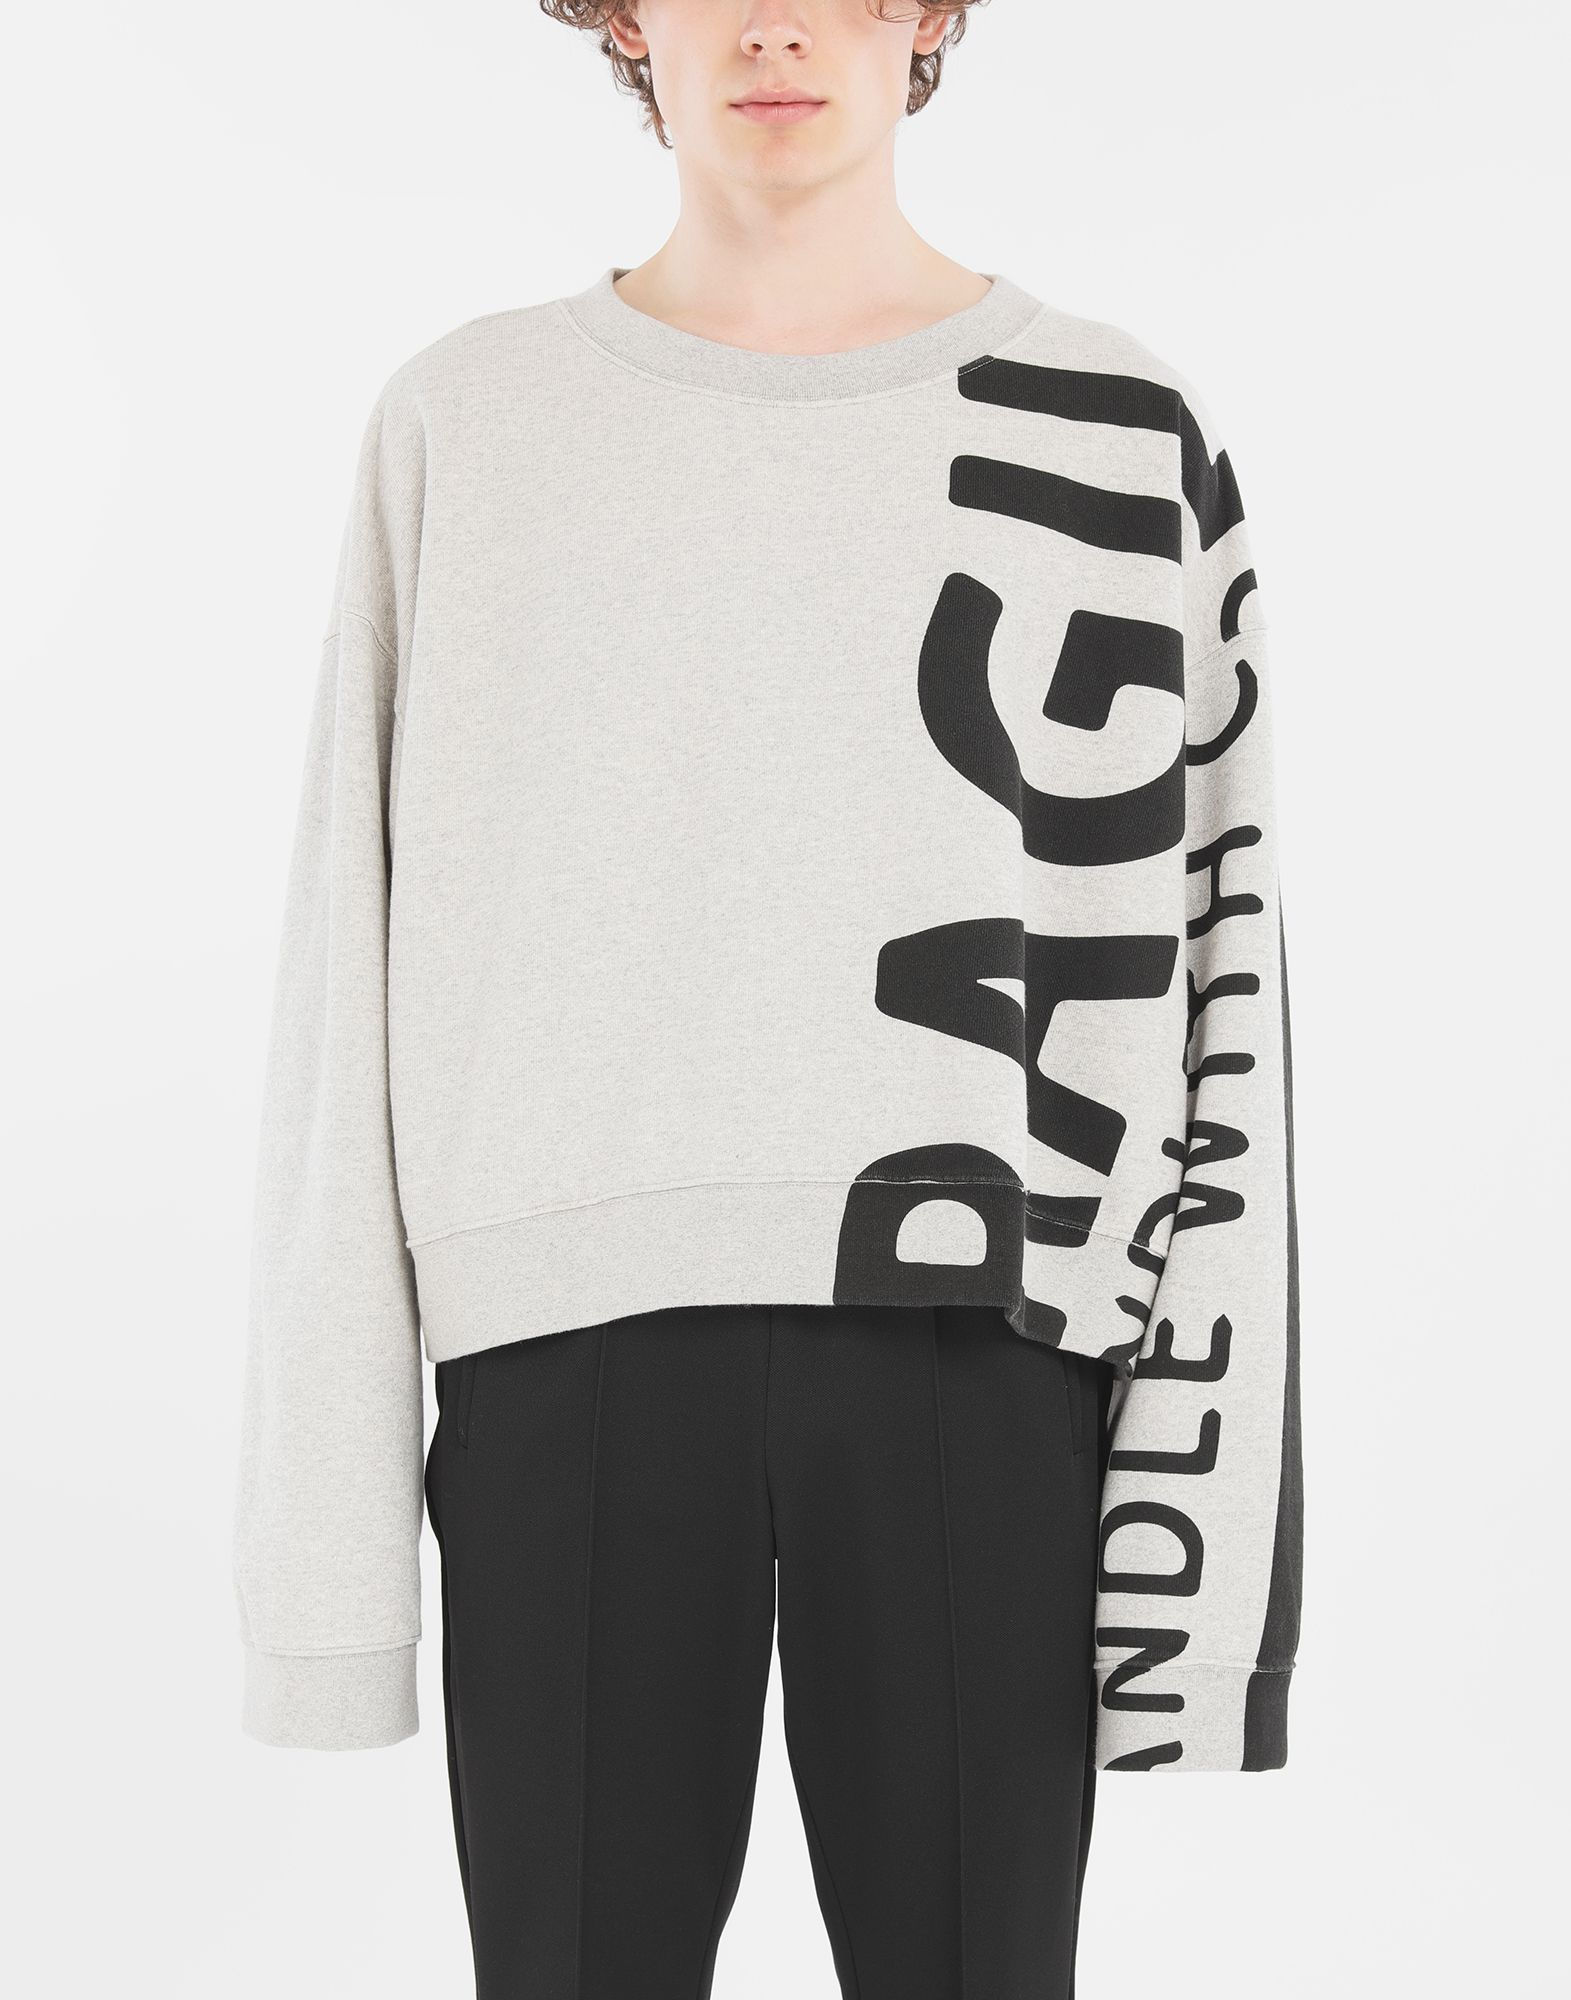 MAISON MARGIELA Sweatshirt 'Fragile' Sweatshirt Herr r